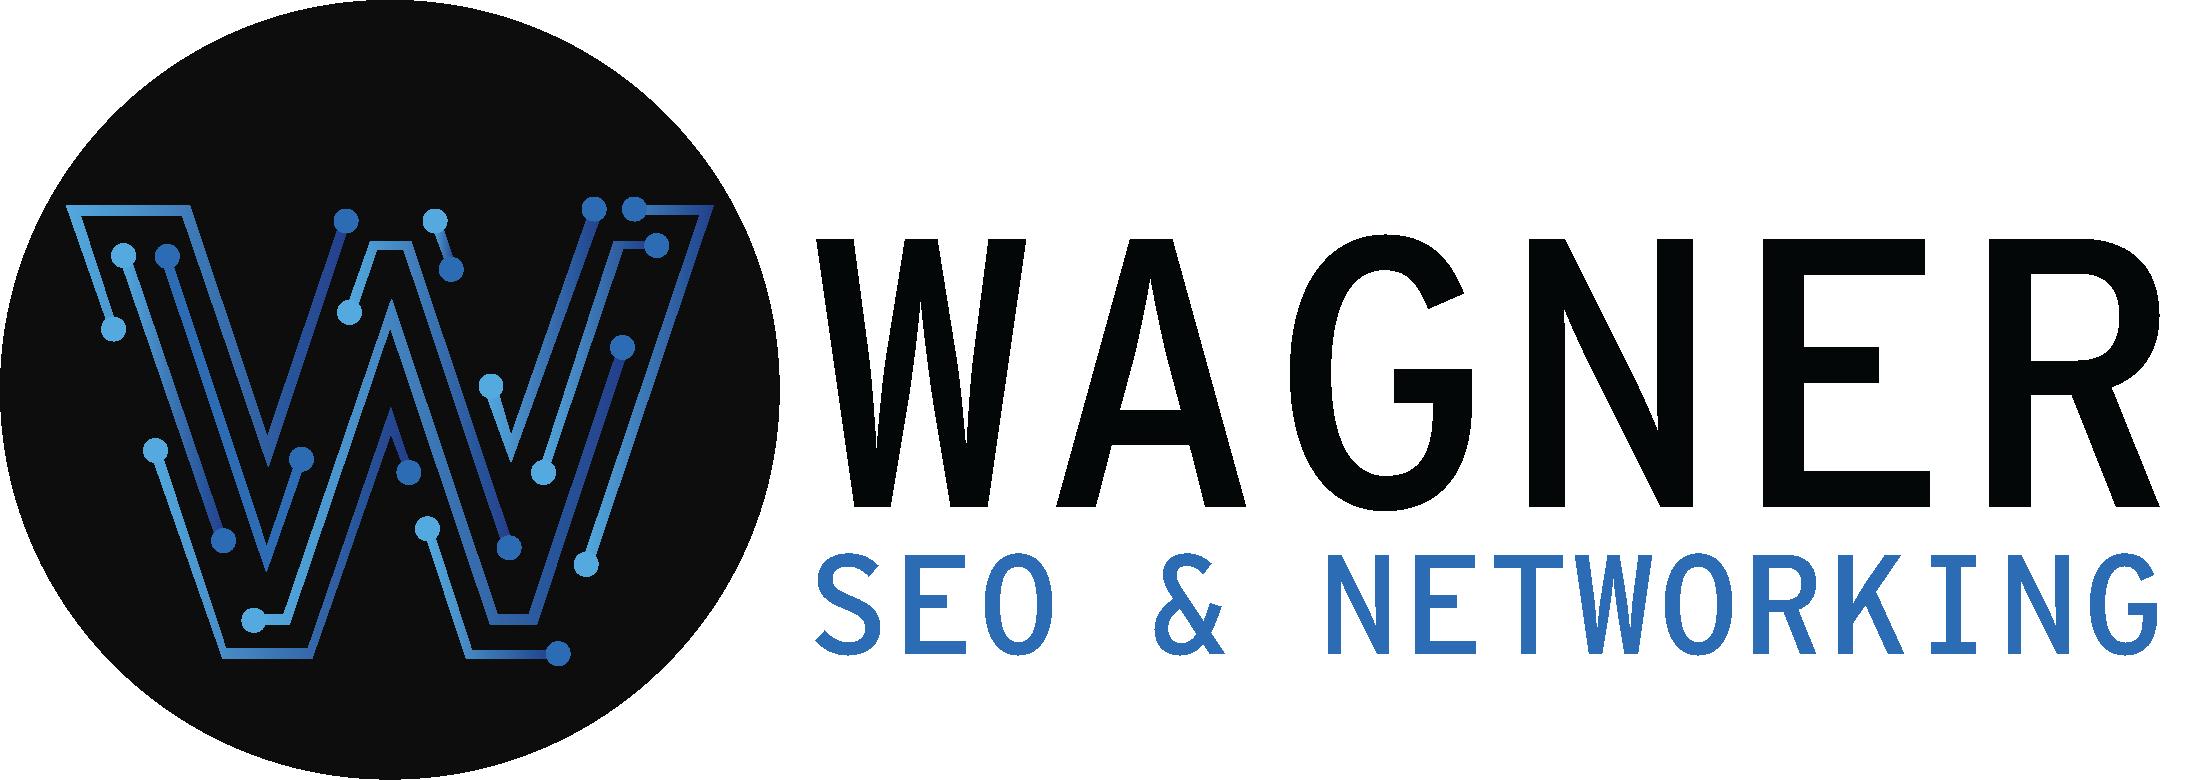 Wagner SEO & Networking Solutions in Oakwood, Ohio